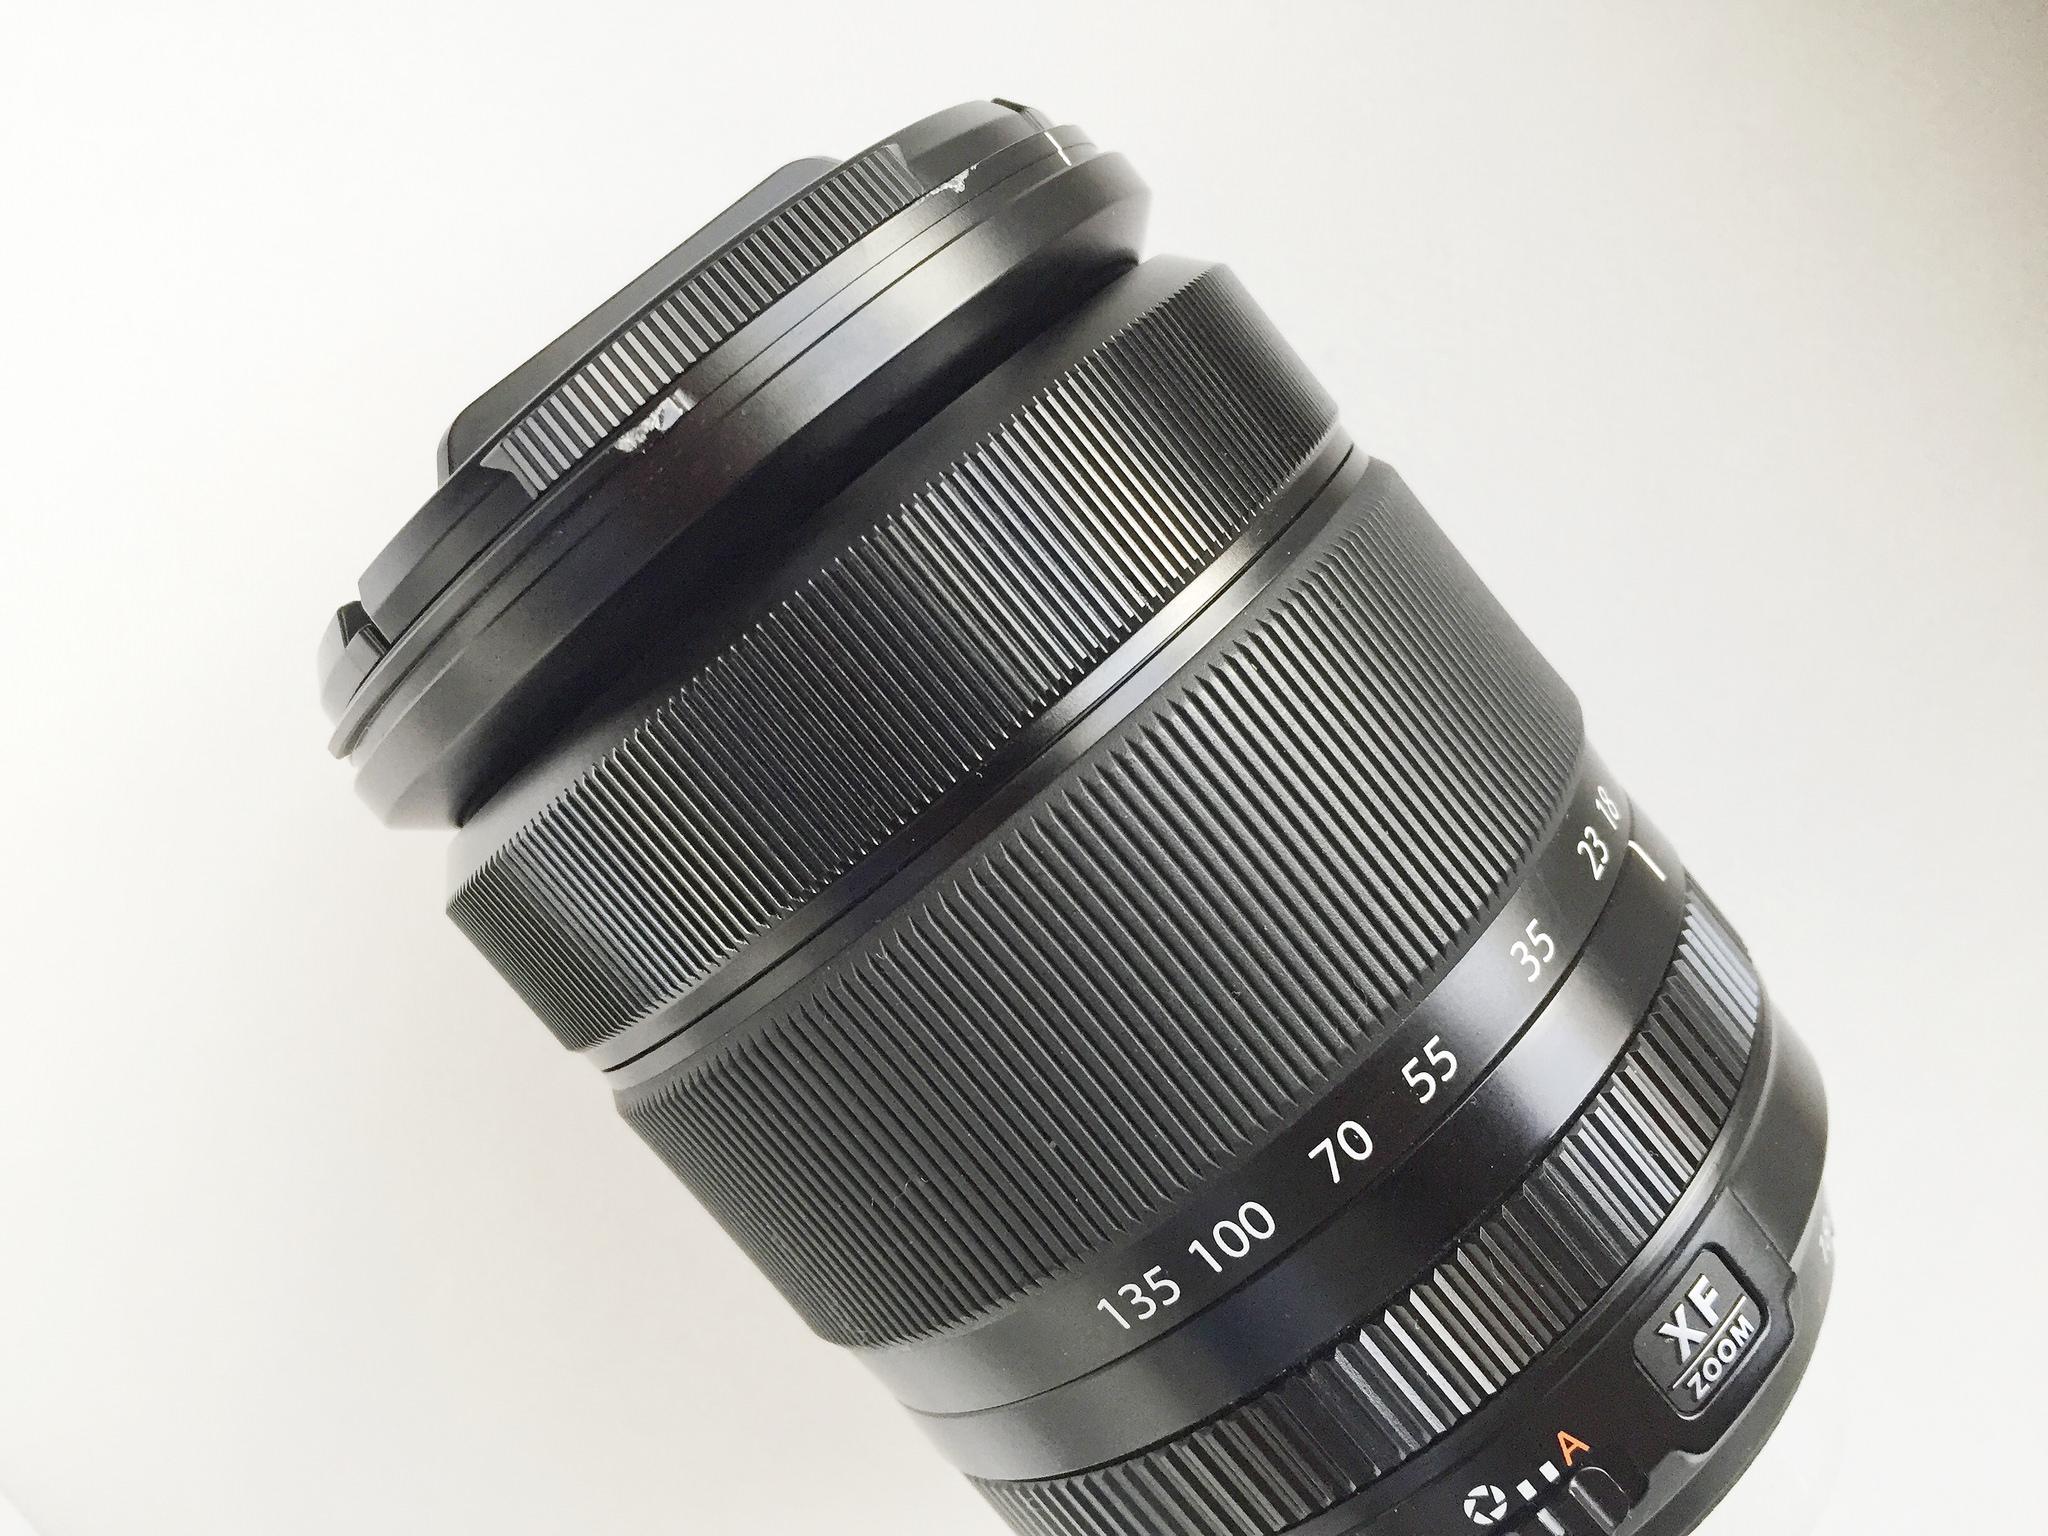 Lens Damage on 18-135mm XF